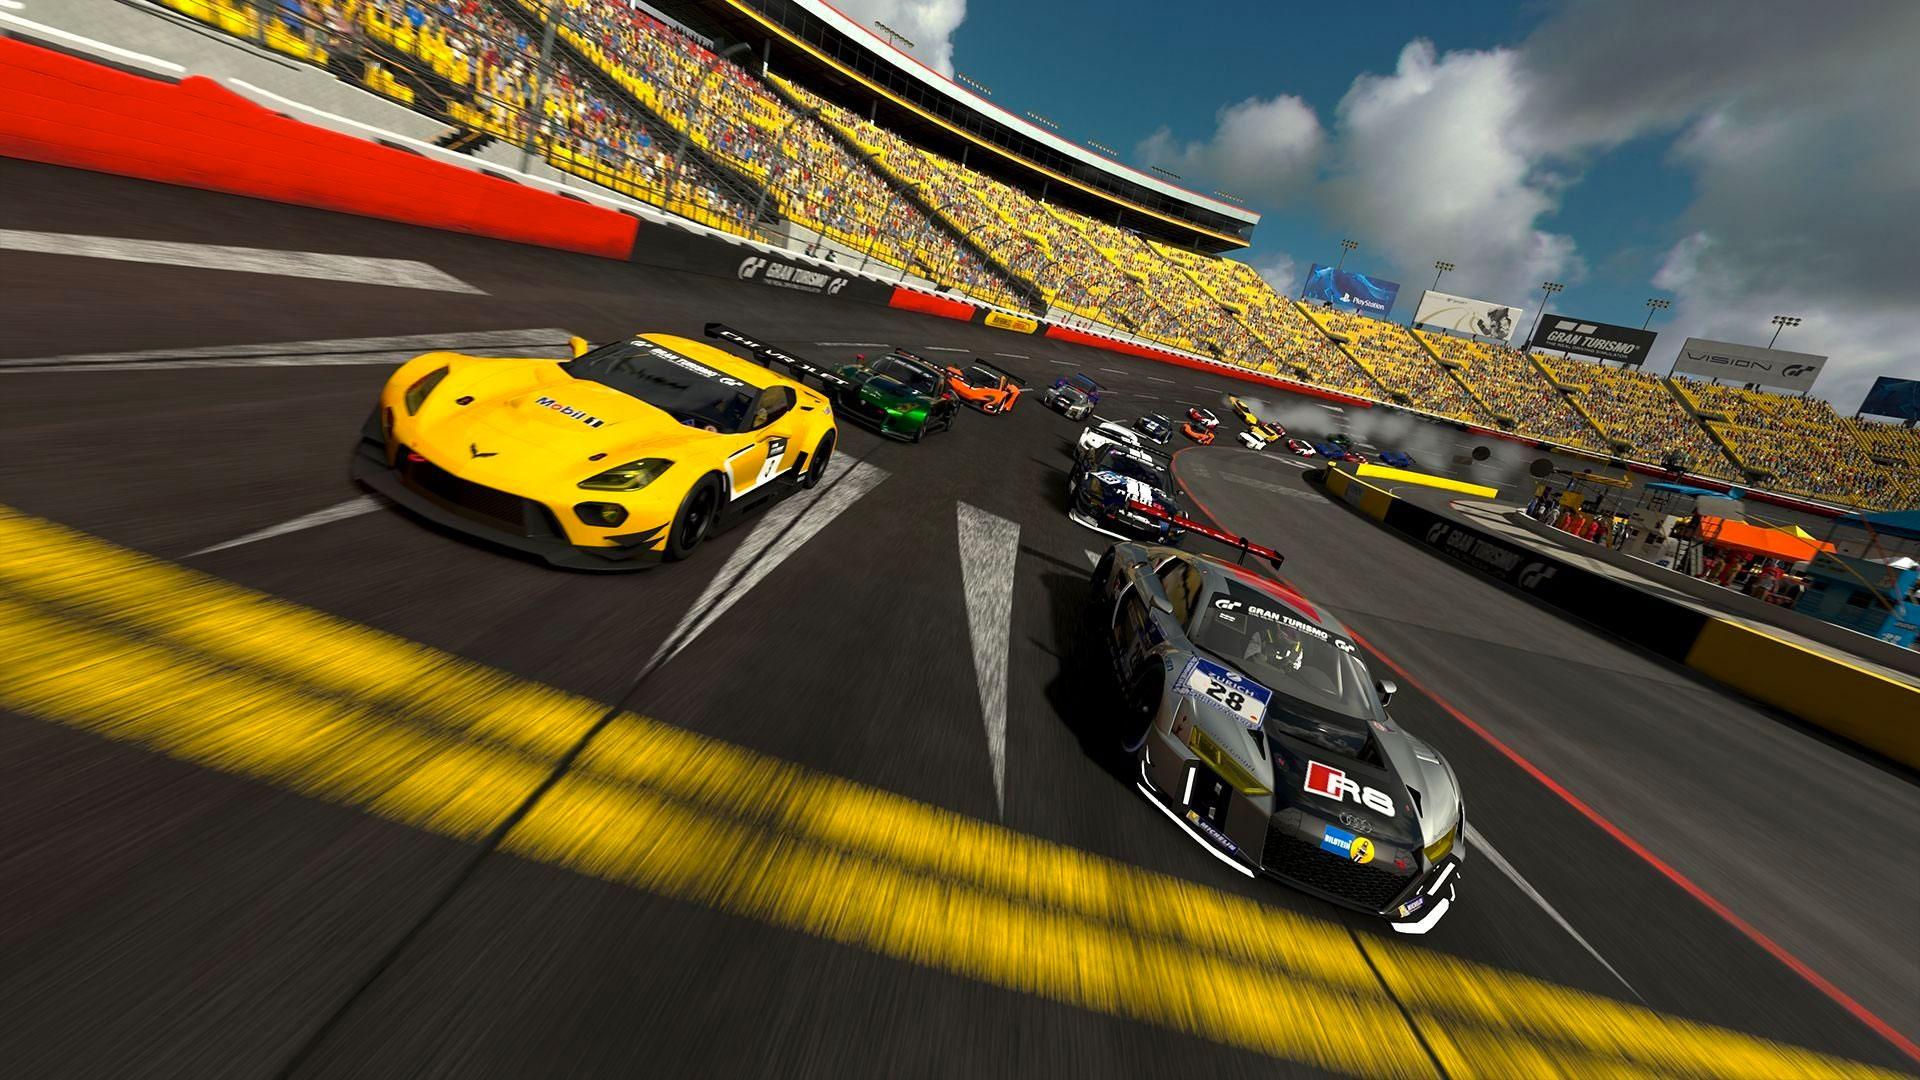 Epic Movie Hd Wallpapers Gran Turismo Sport Wallpapers In Ultra Hd 4k Gameranx